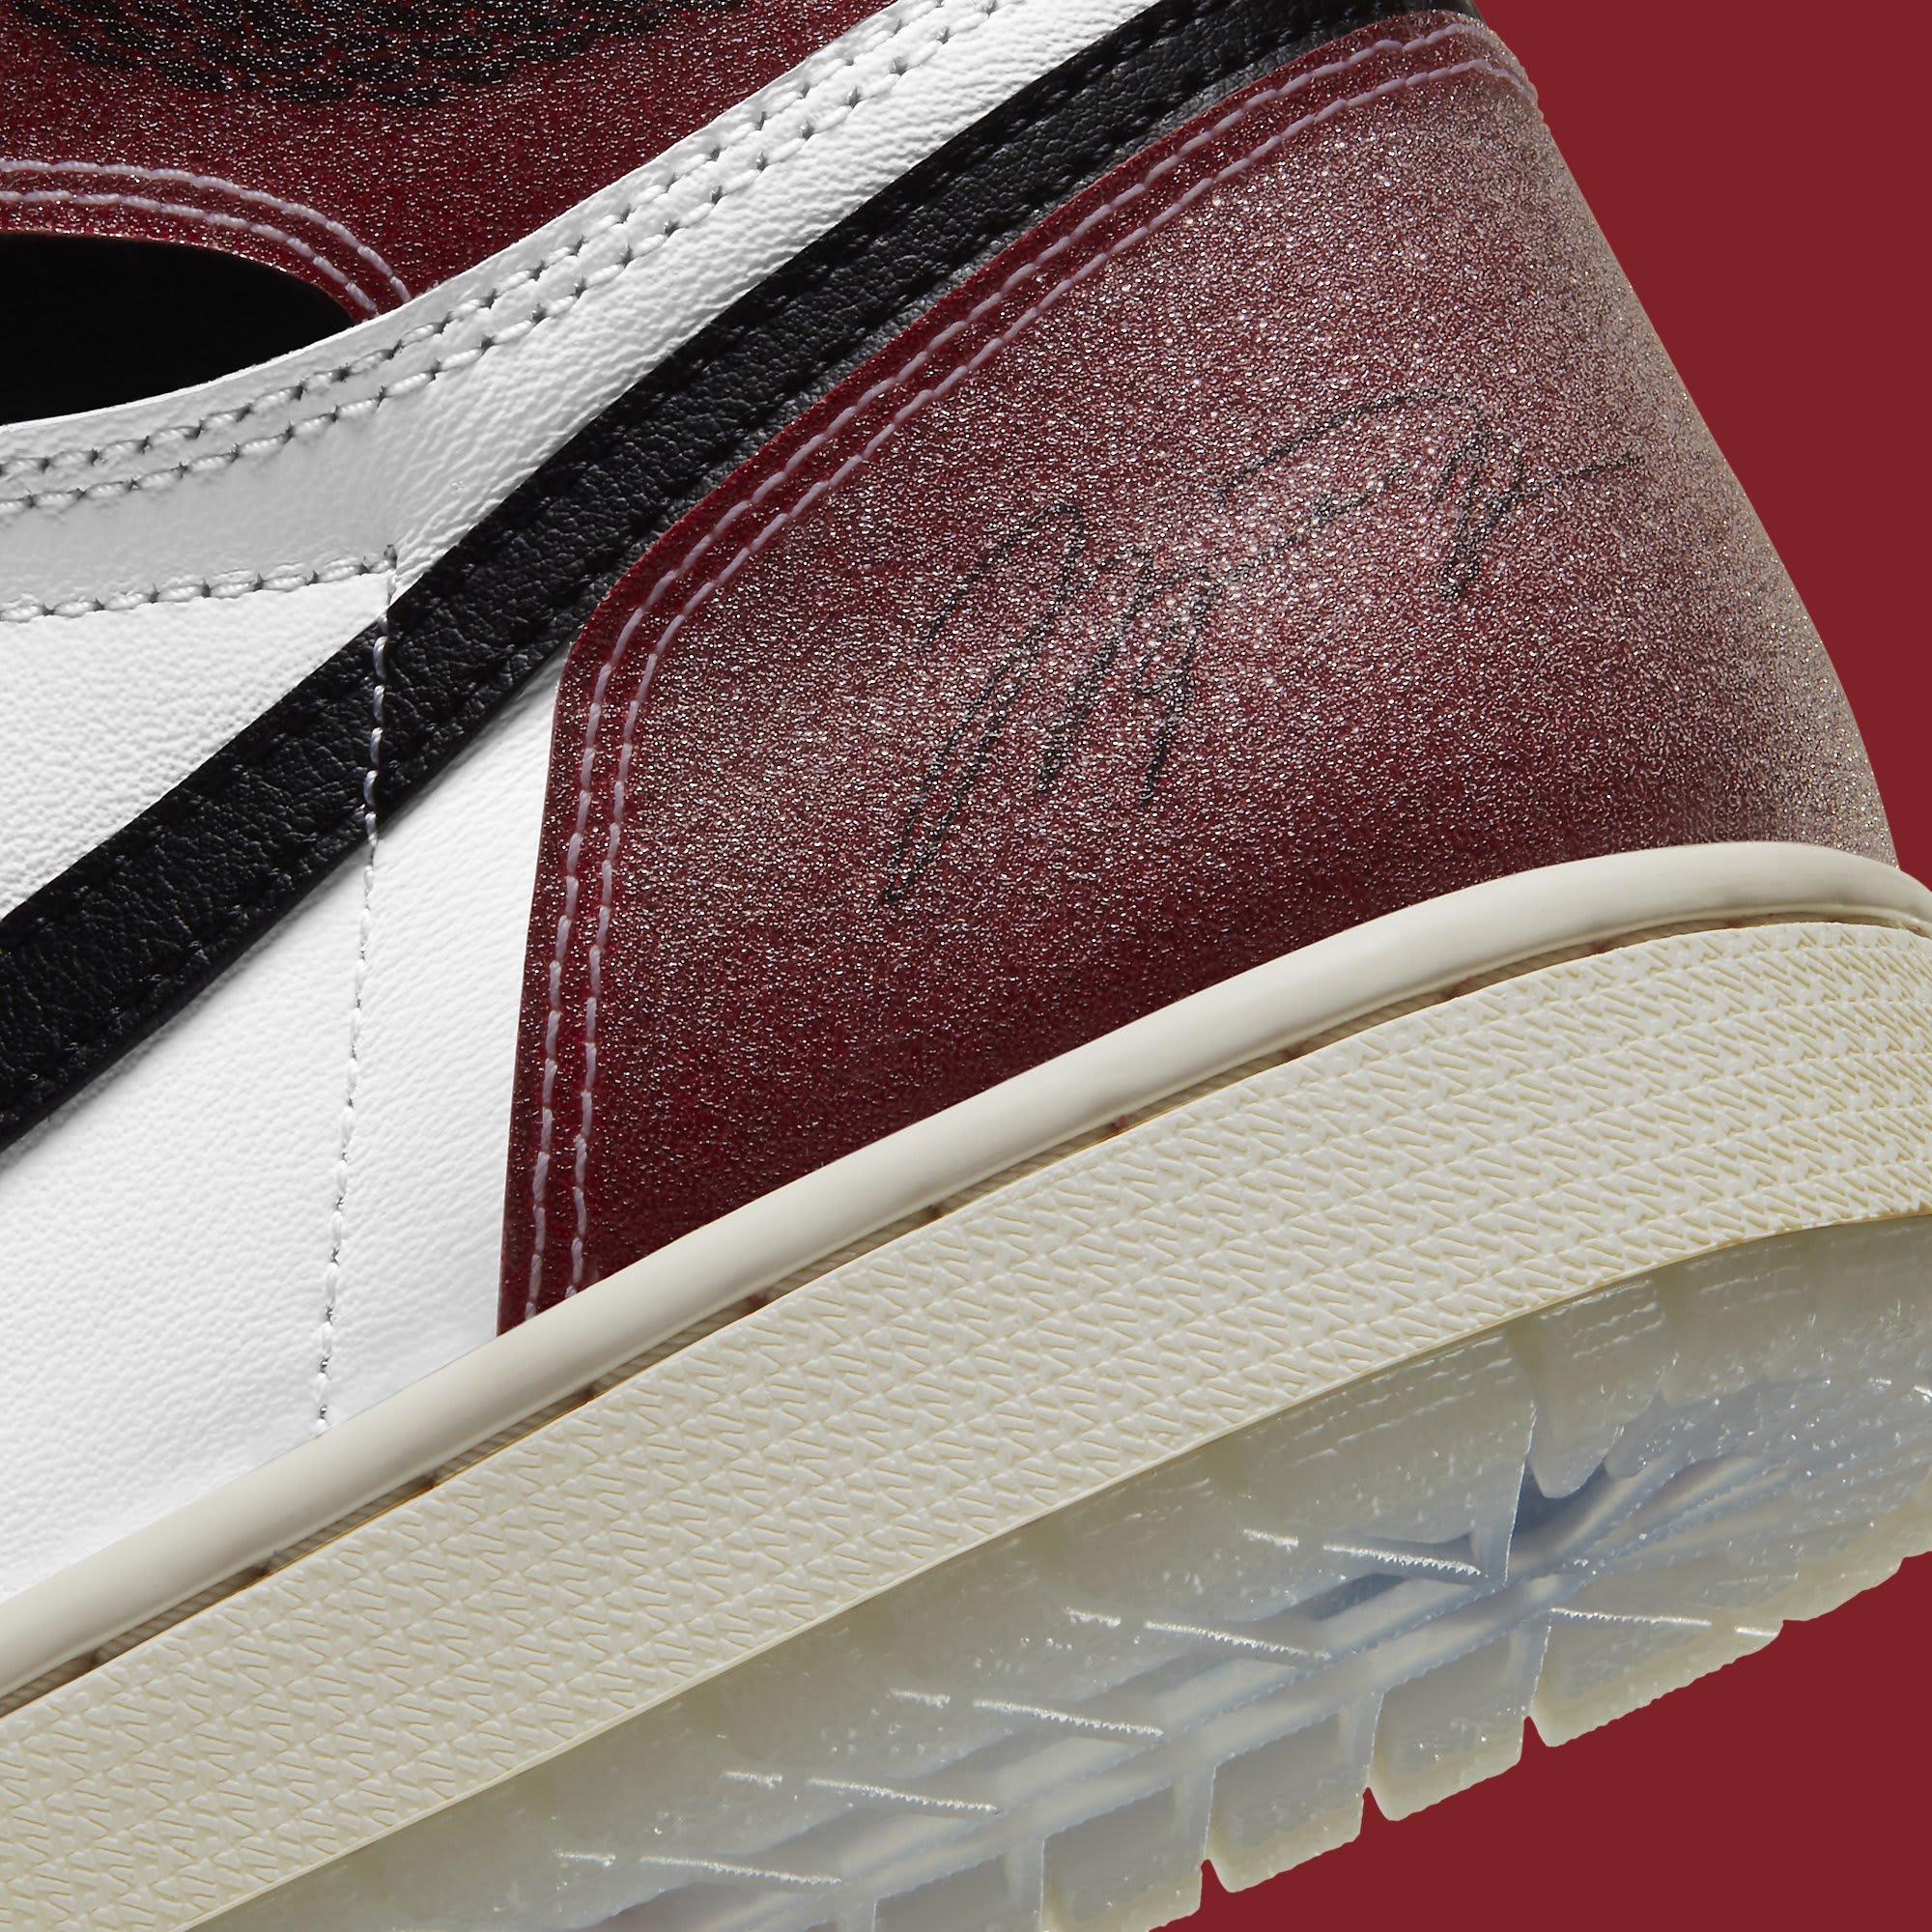 Trophy Room x Air Jordan 1 Release Date DA2728-100 Heel Detail